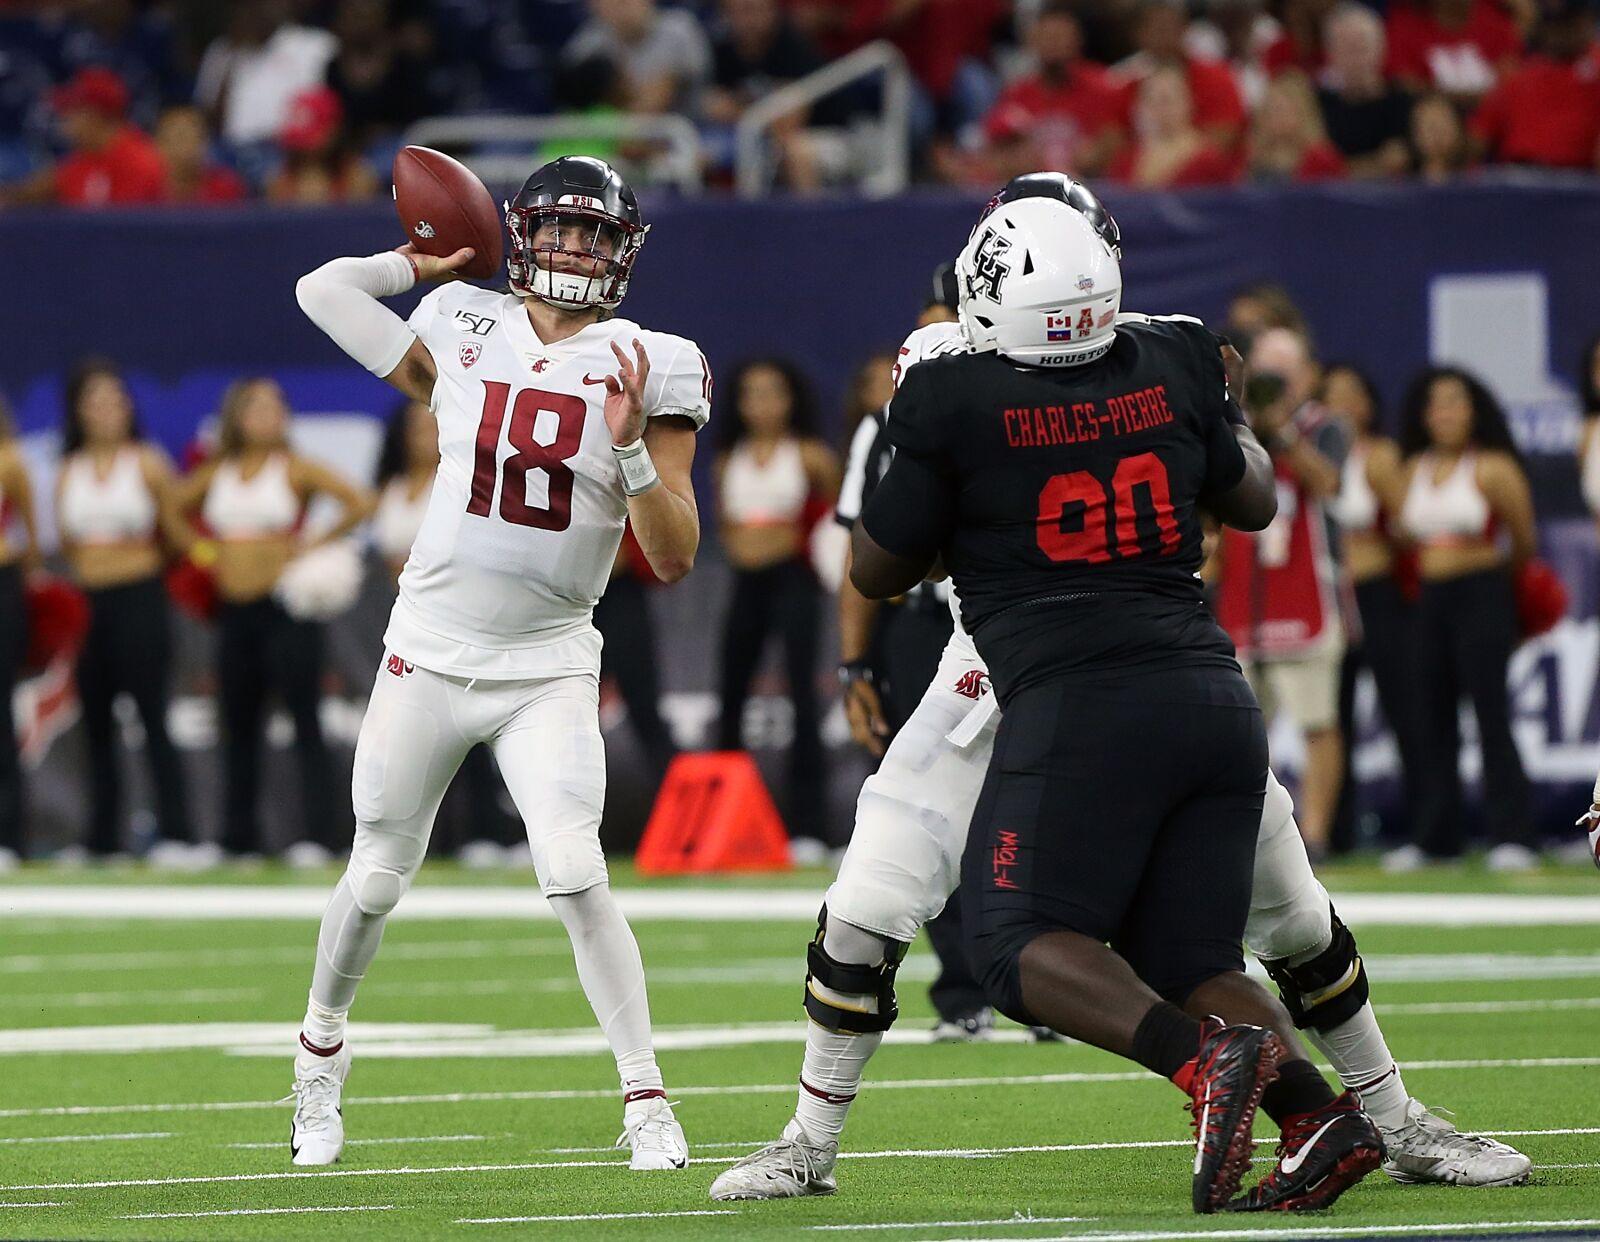 Washington State Football: 3 takeaways from win over Houston in Week 3